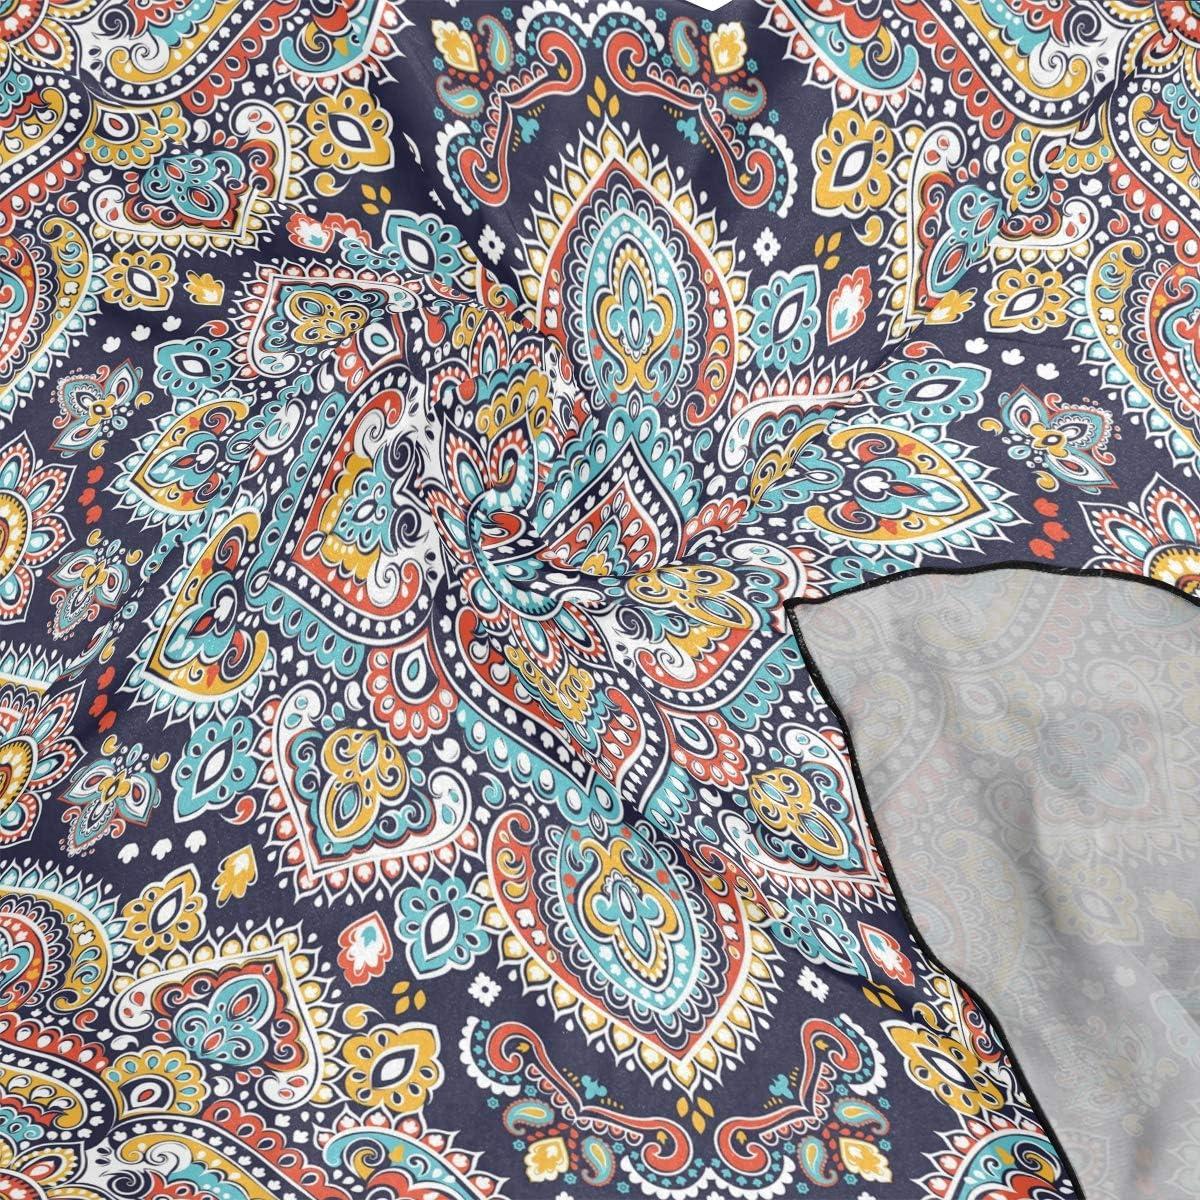 XLING Fashion Square Scarf Indian Floral Paisley Ethnic Mandala Lightweight Sunscreen Scarves Muffler Hair Wrap Headscarf Neckerchief for Women Men